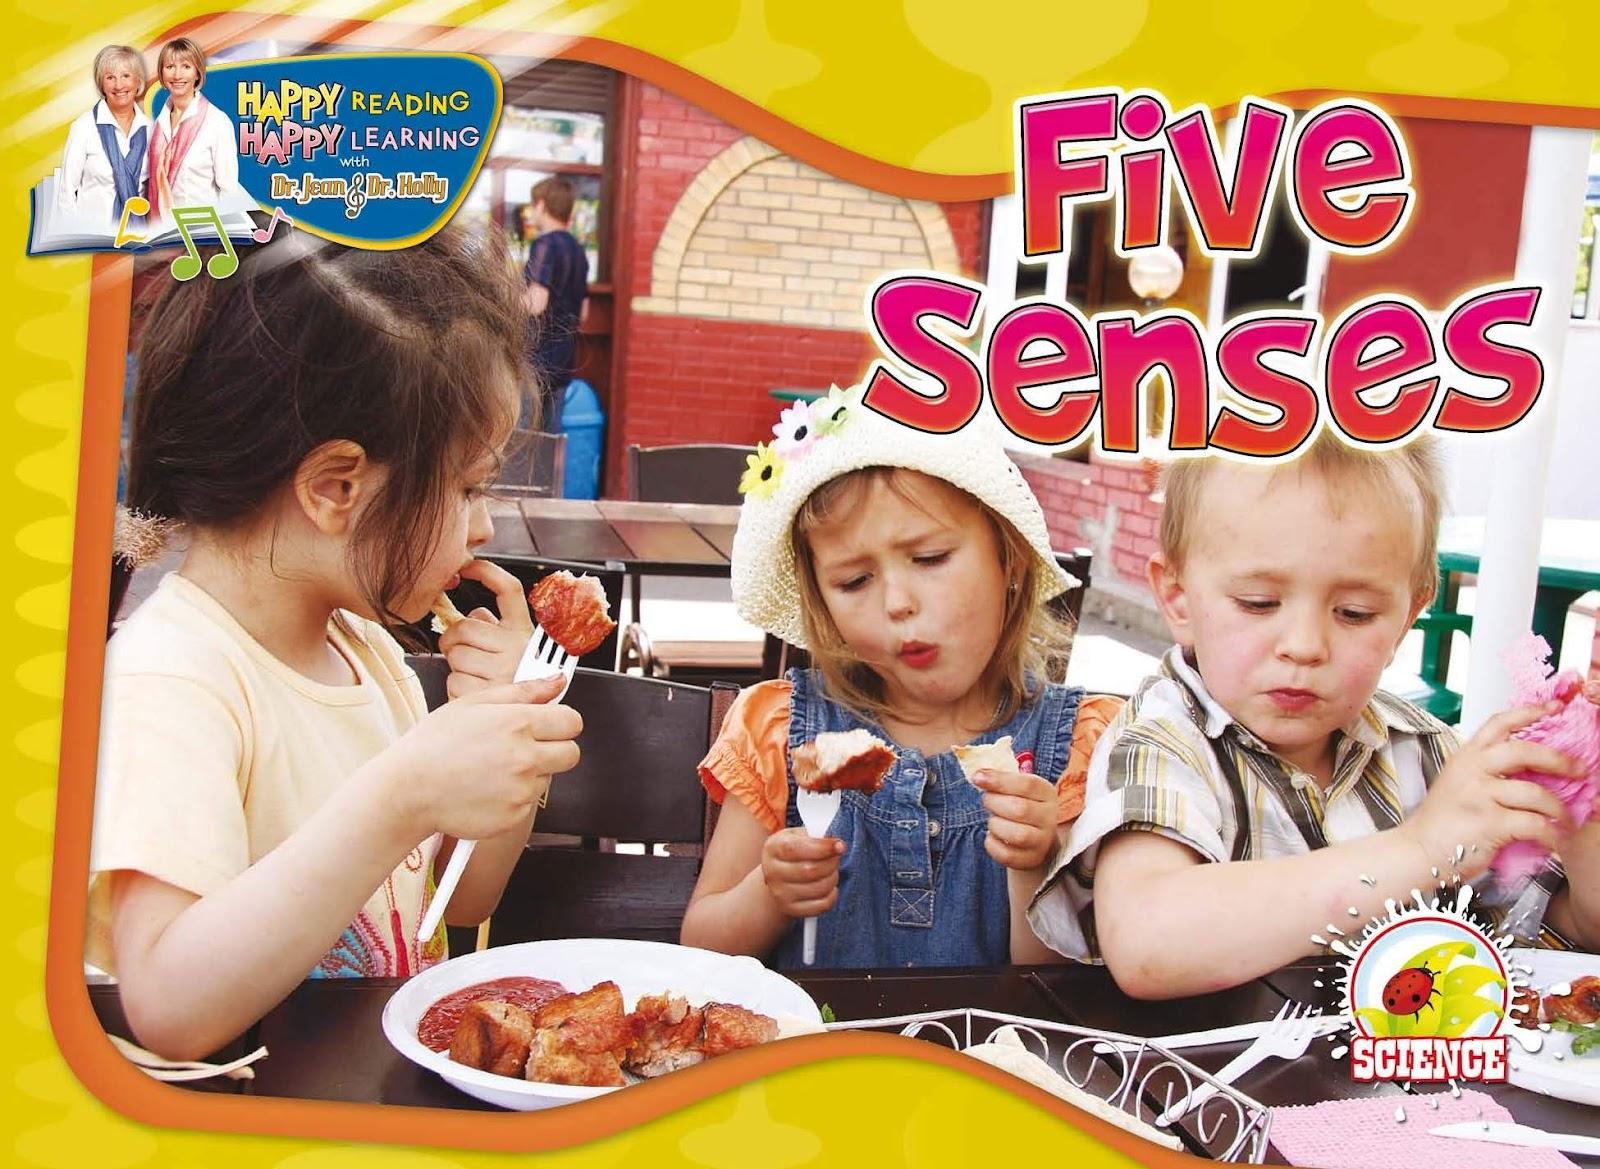 Happt Reading Happy Learning Five Senses Book